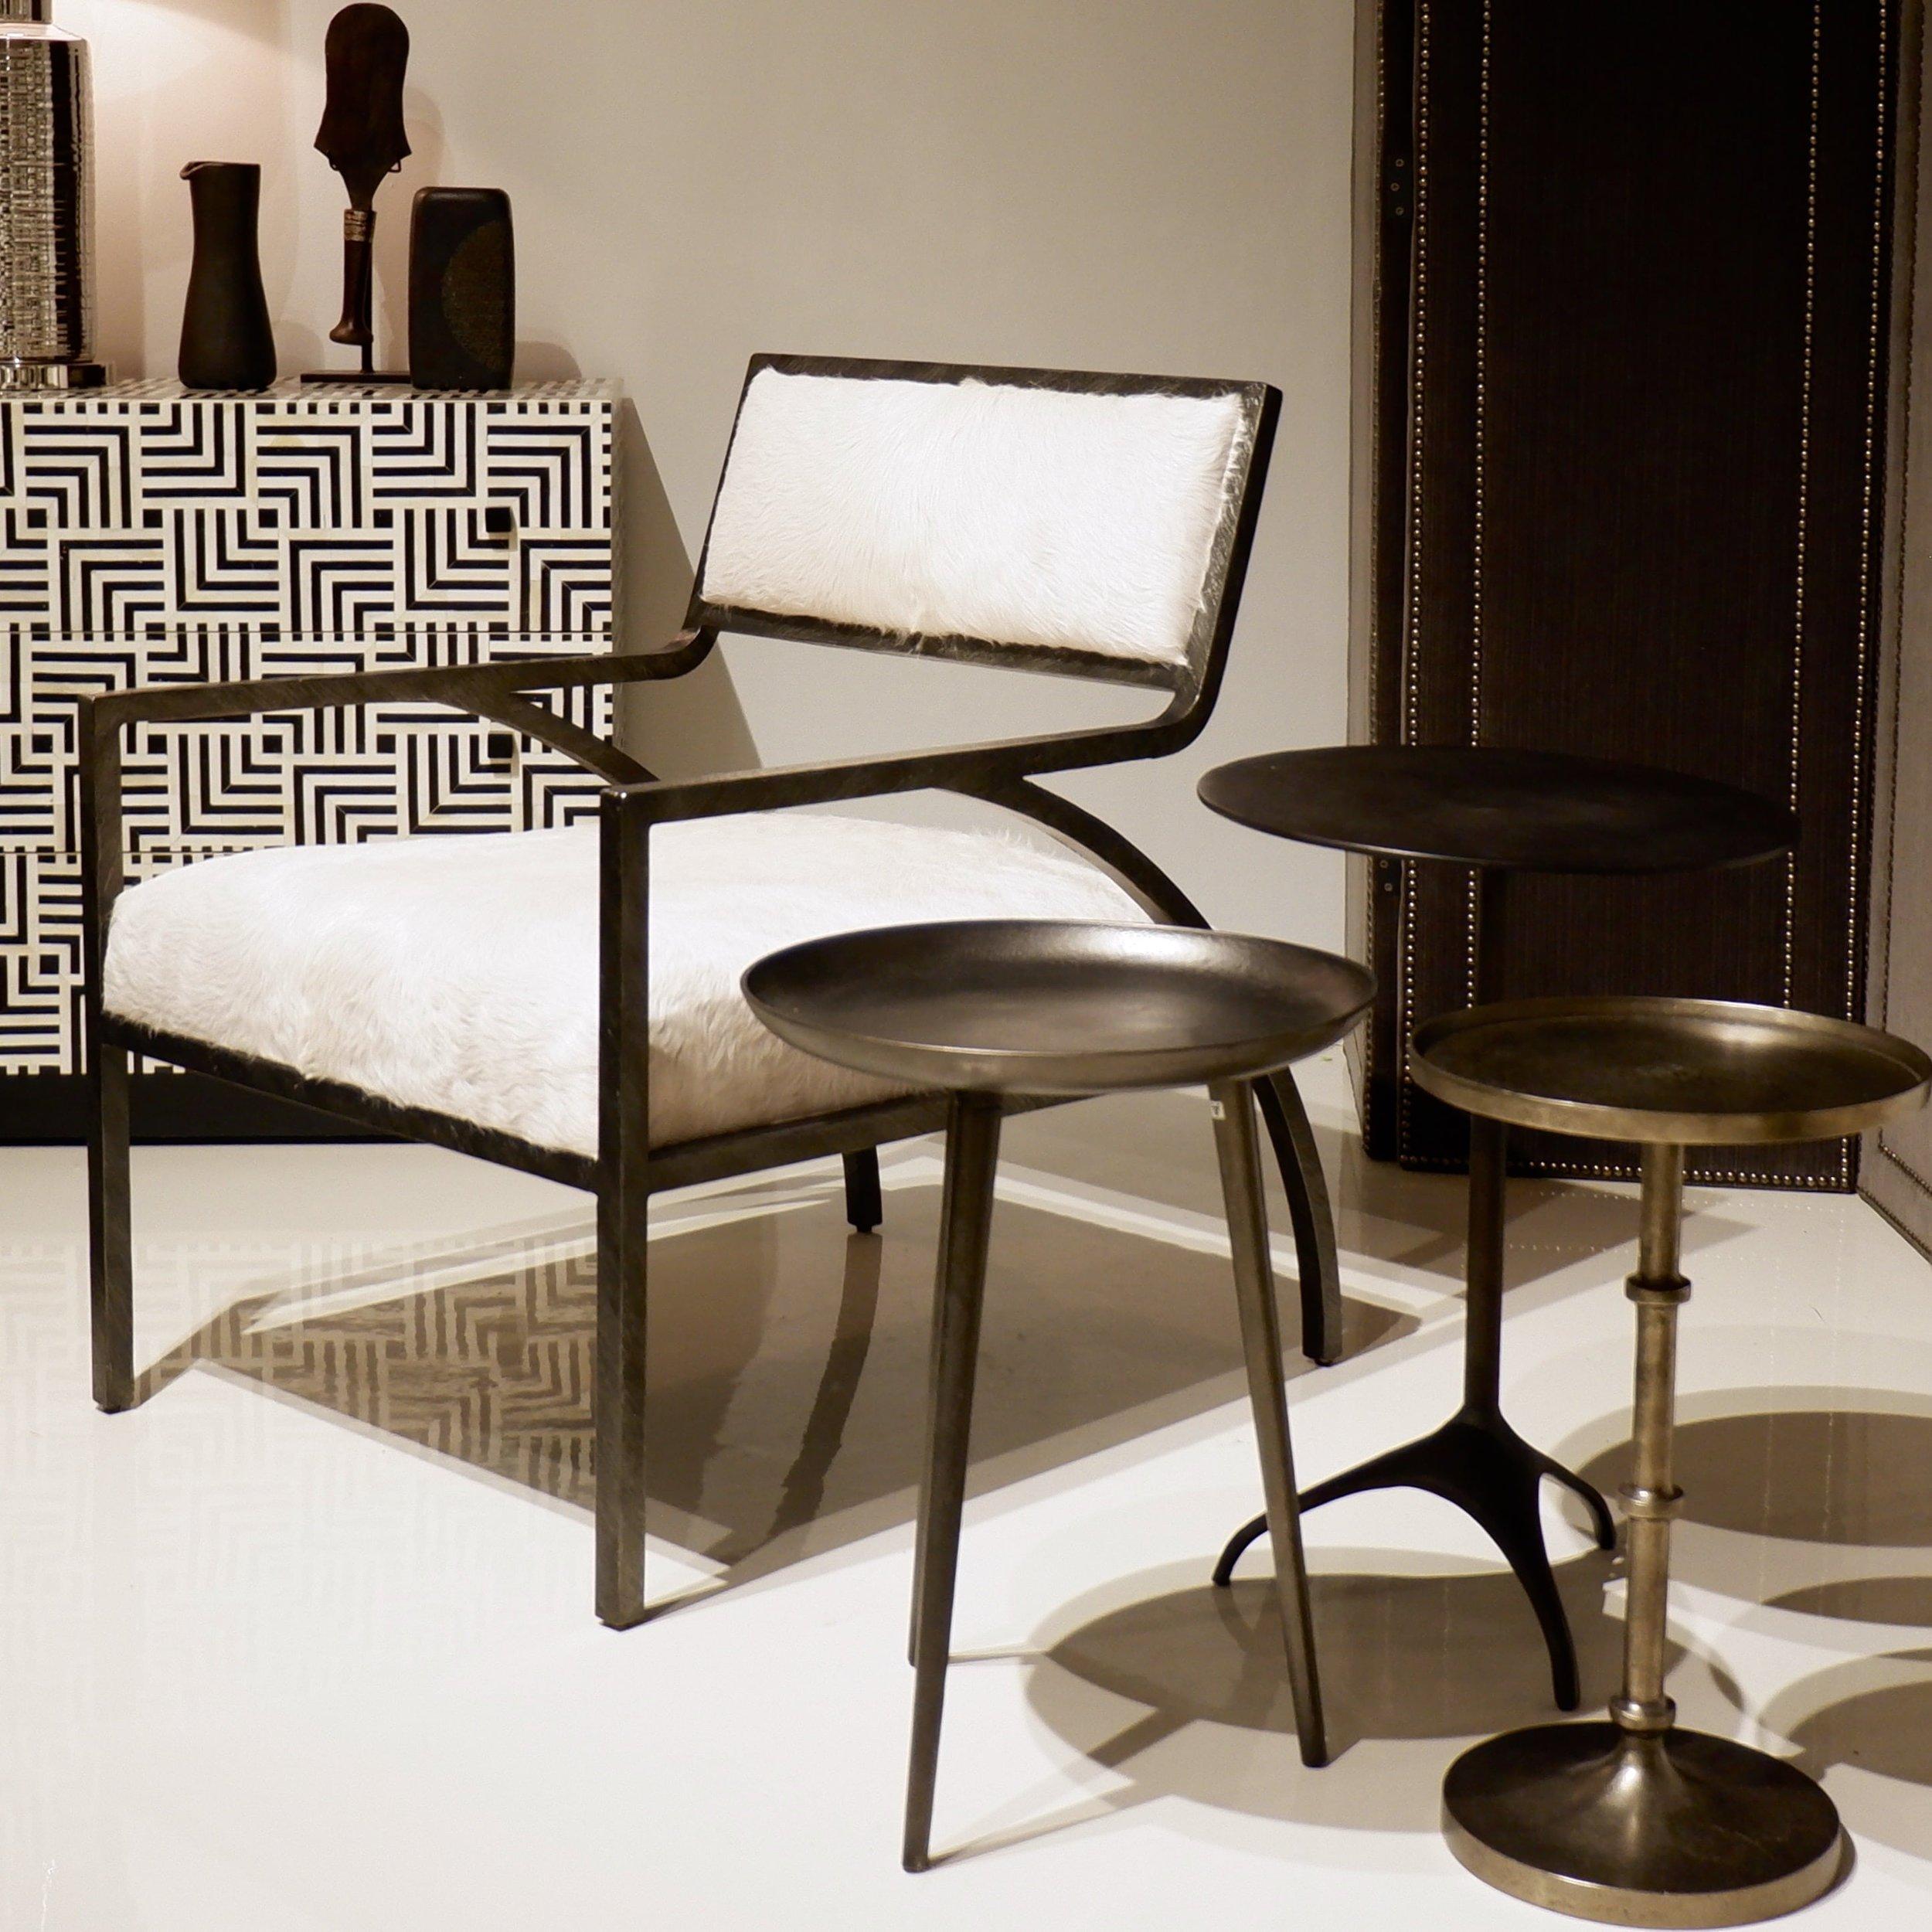 A hair-on-hide chair at Bernhardt.